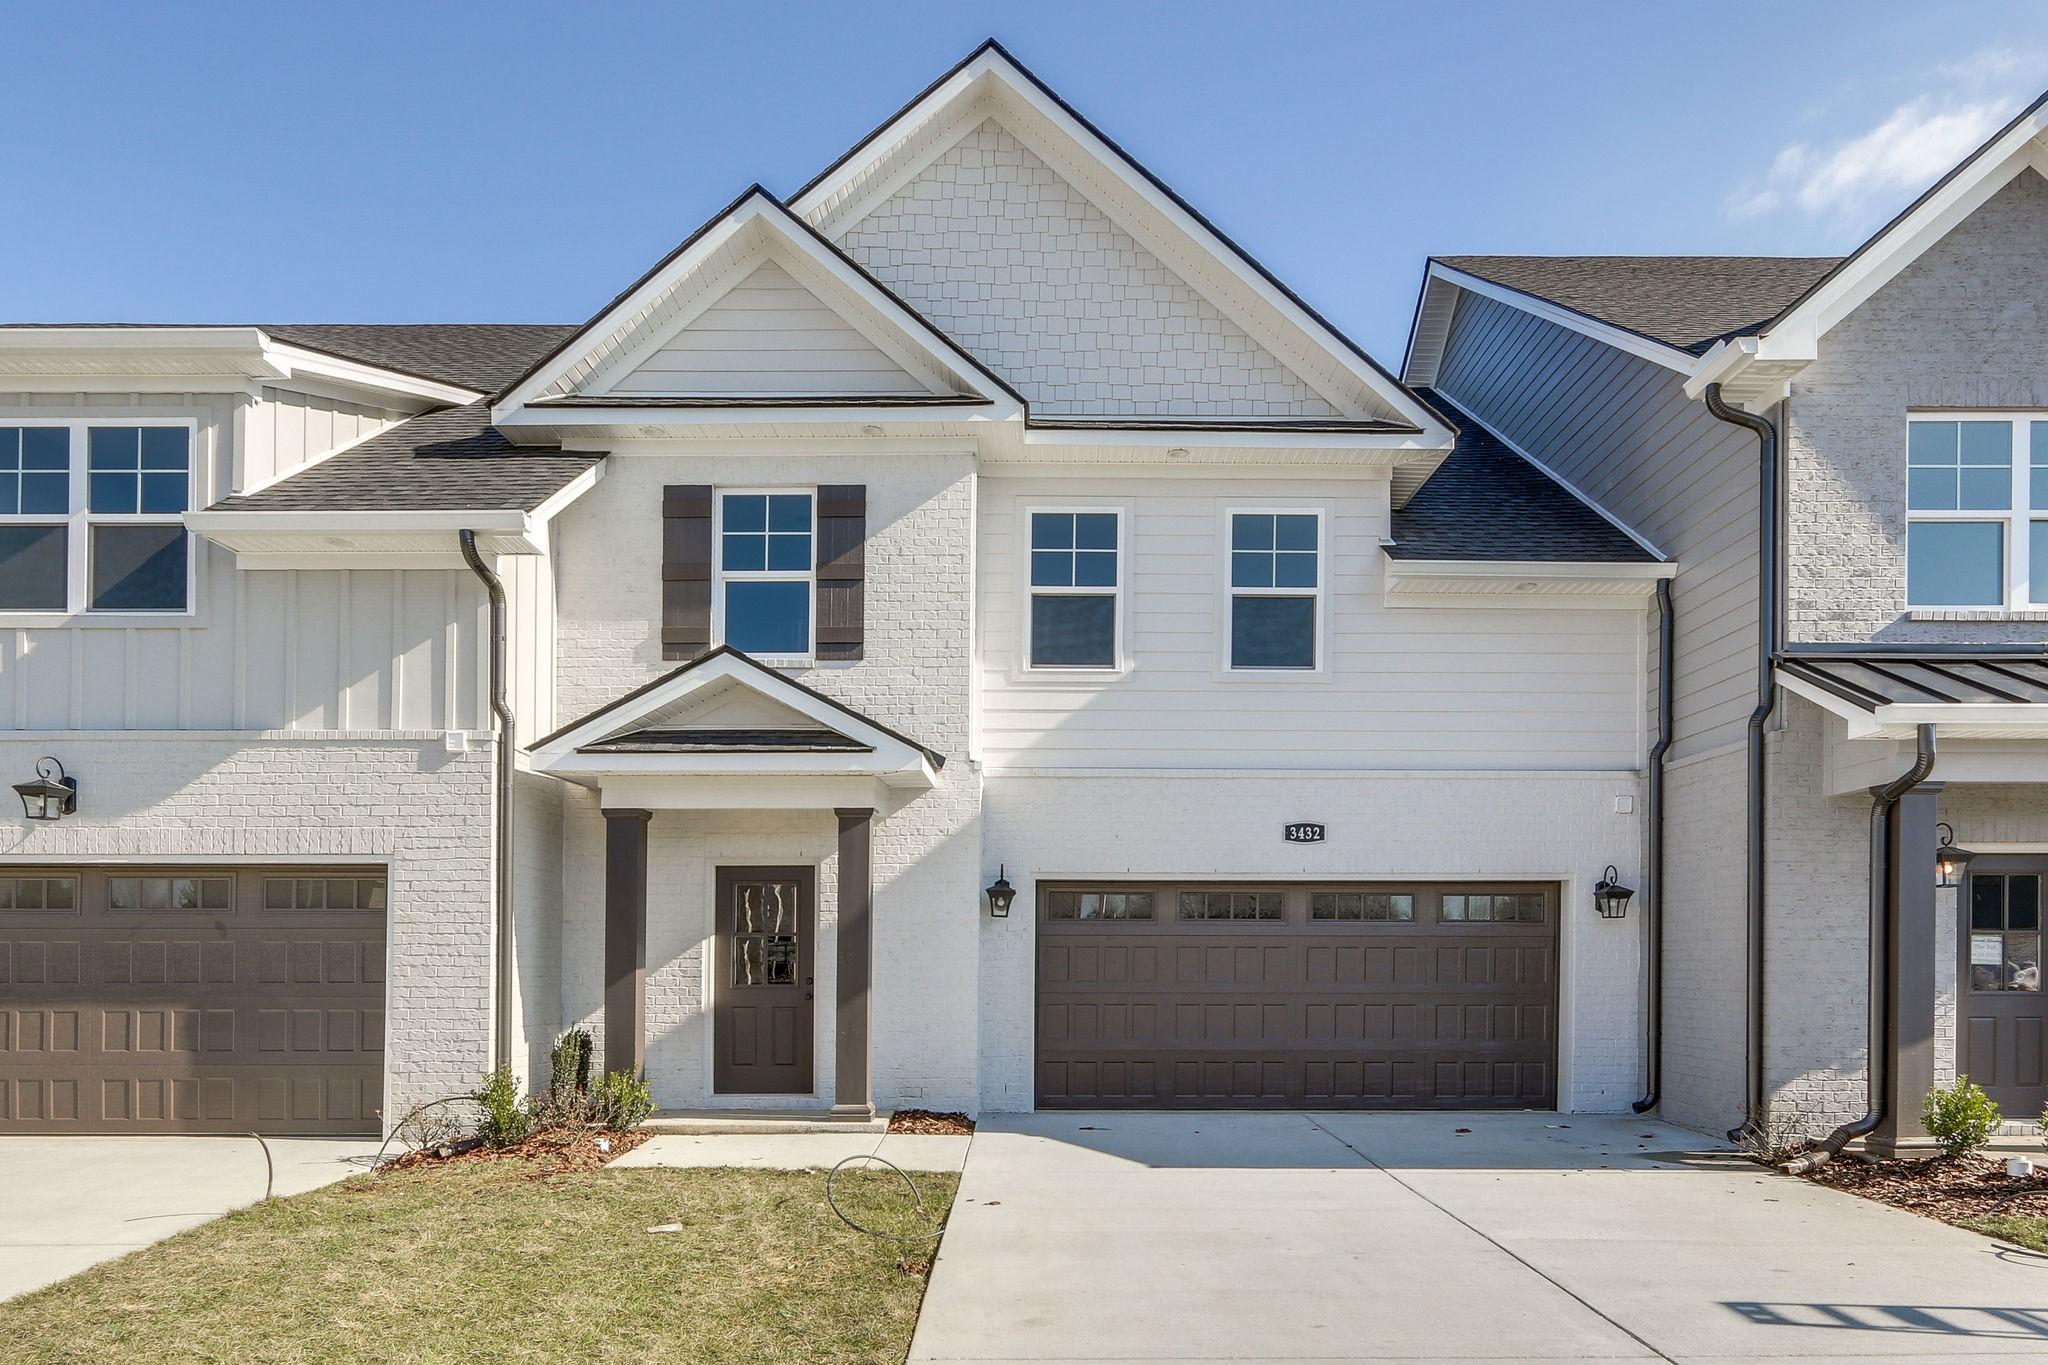 3410 Pershing Drive (TH3) Property Photo - Murfreesboro, TN real estate listing